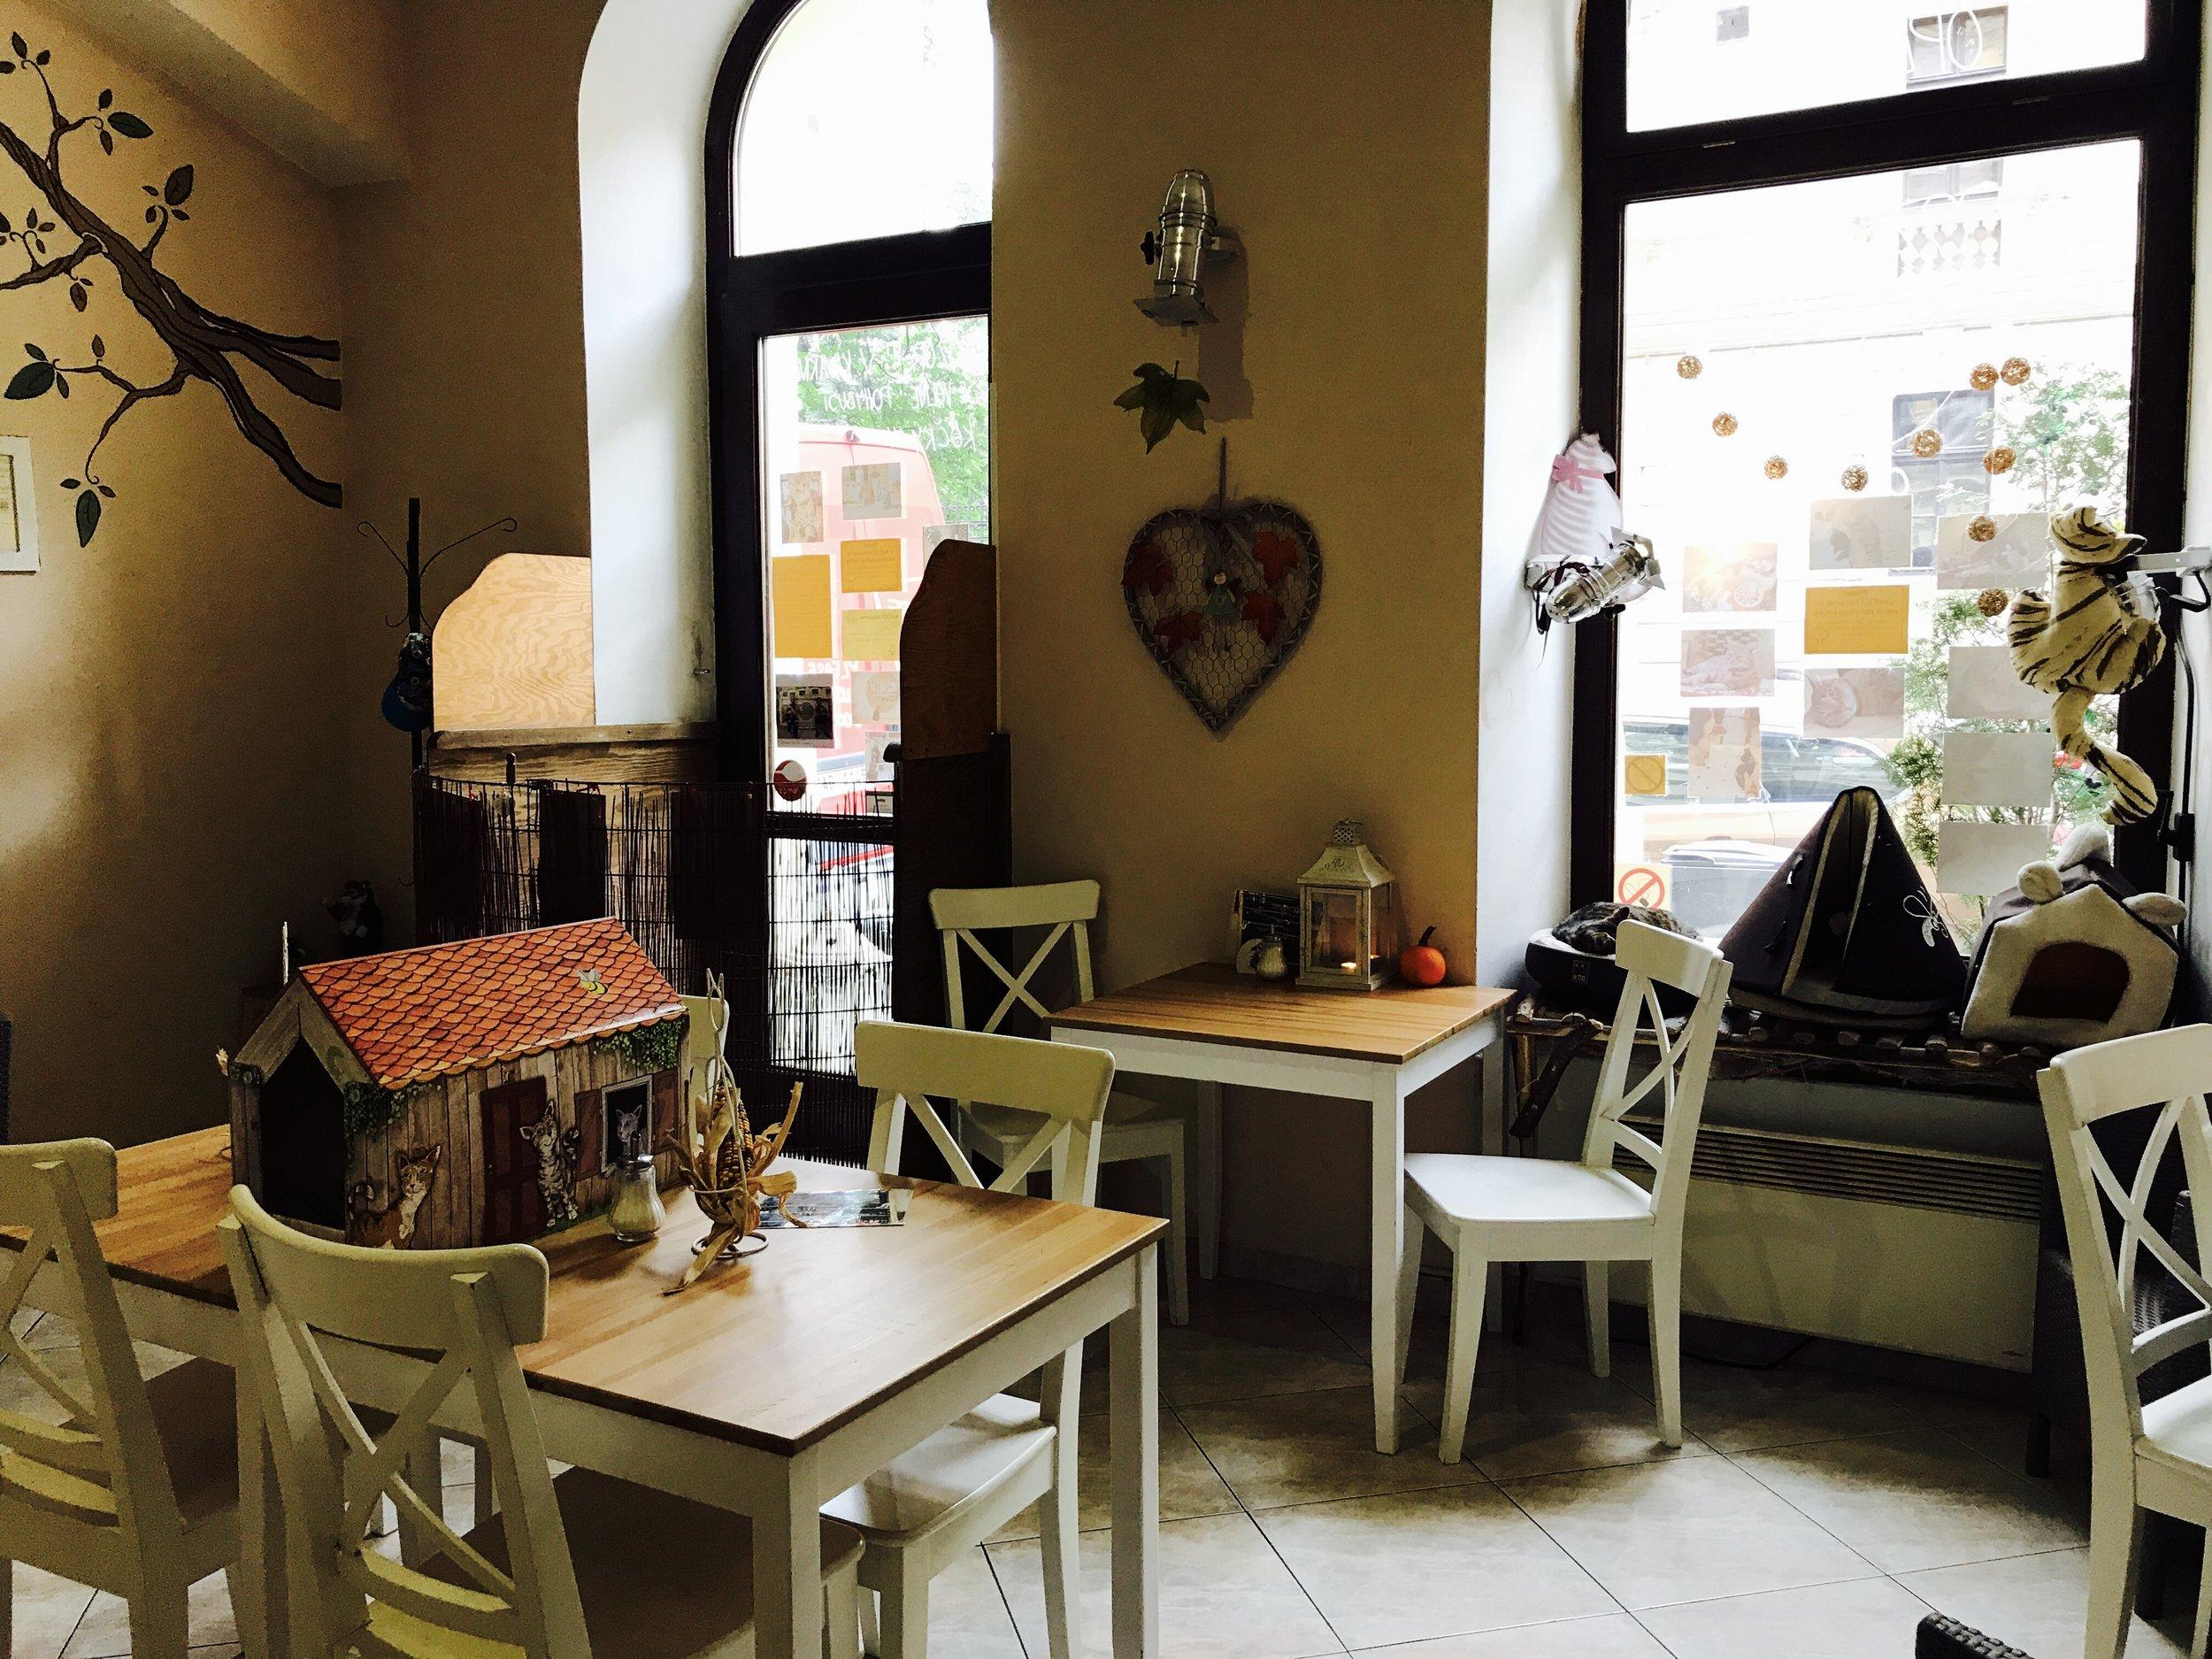 Lots of comfortable cafe seating at Kocici Kavarna in Prague